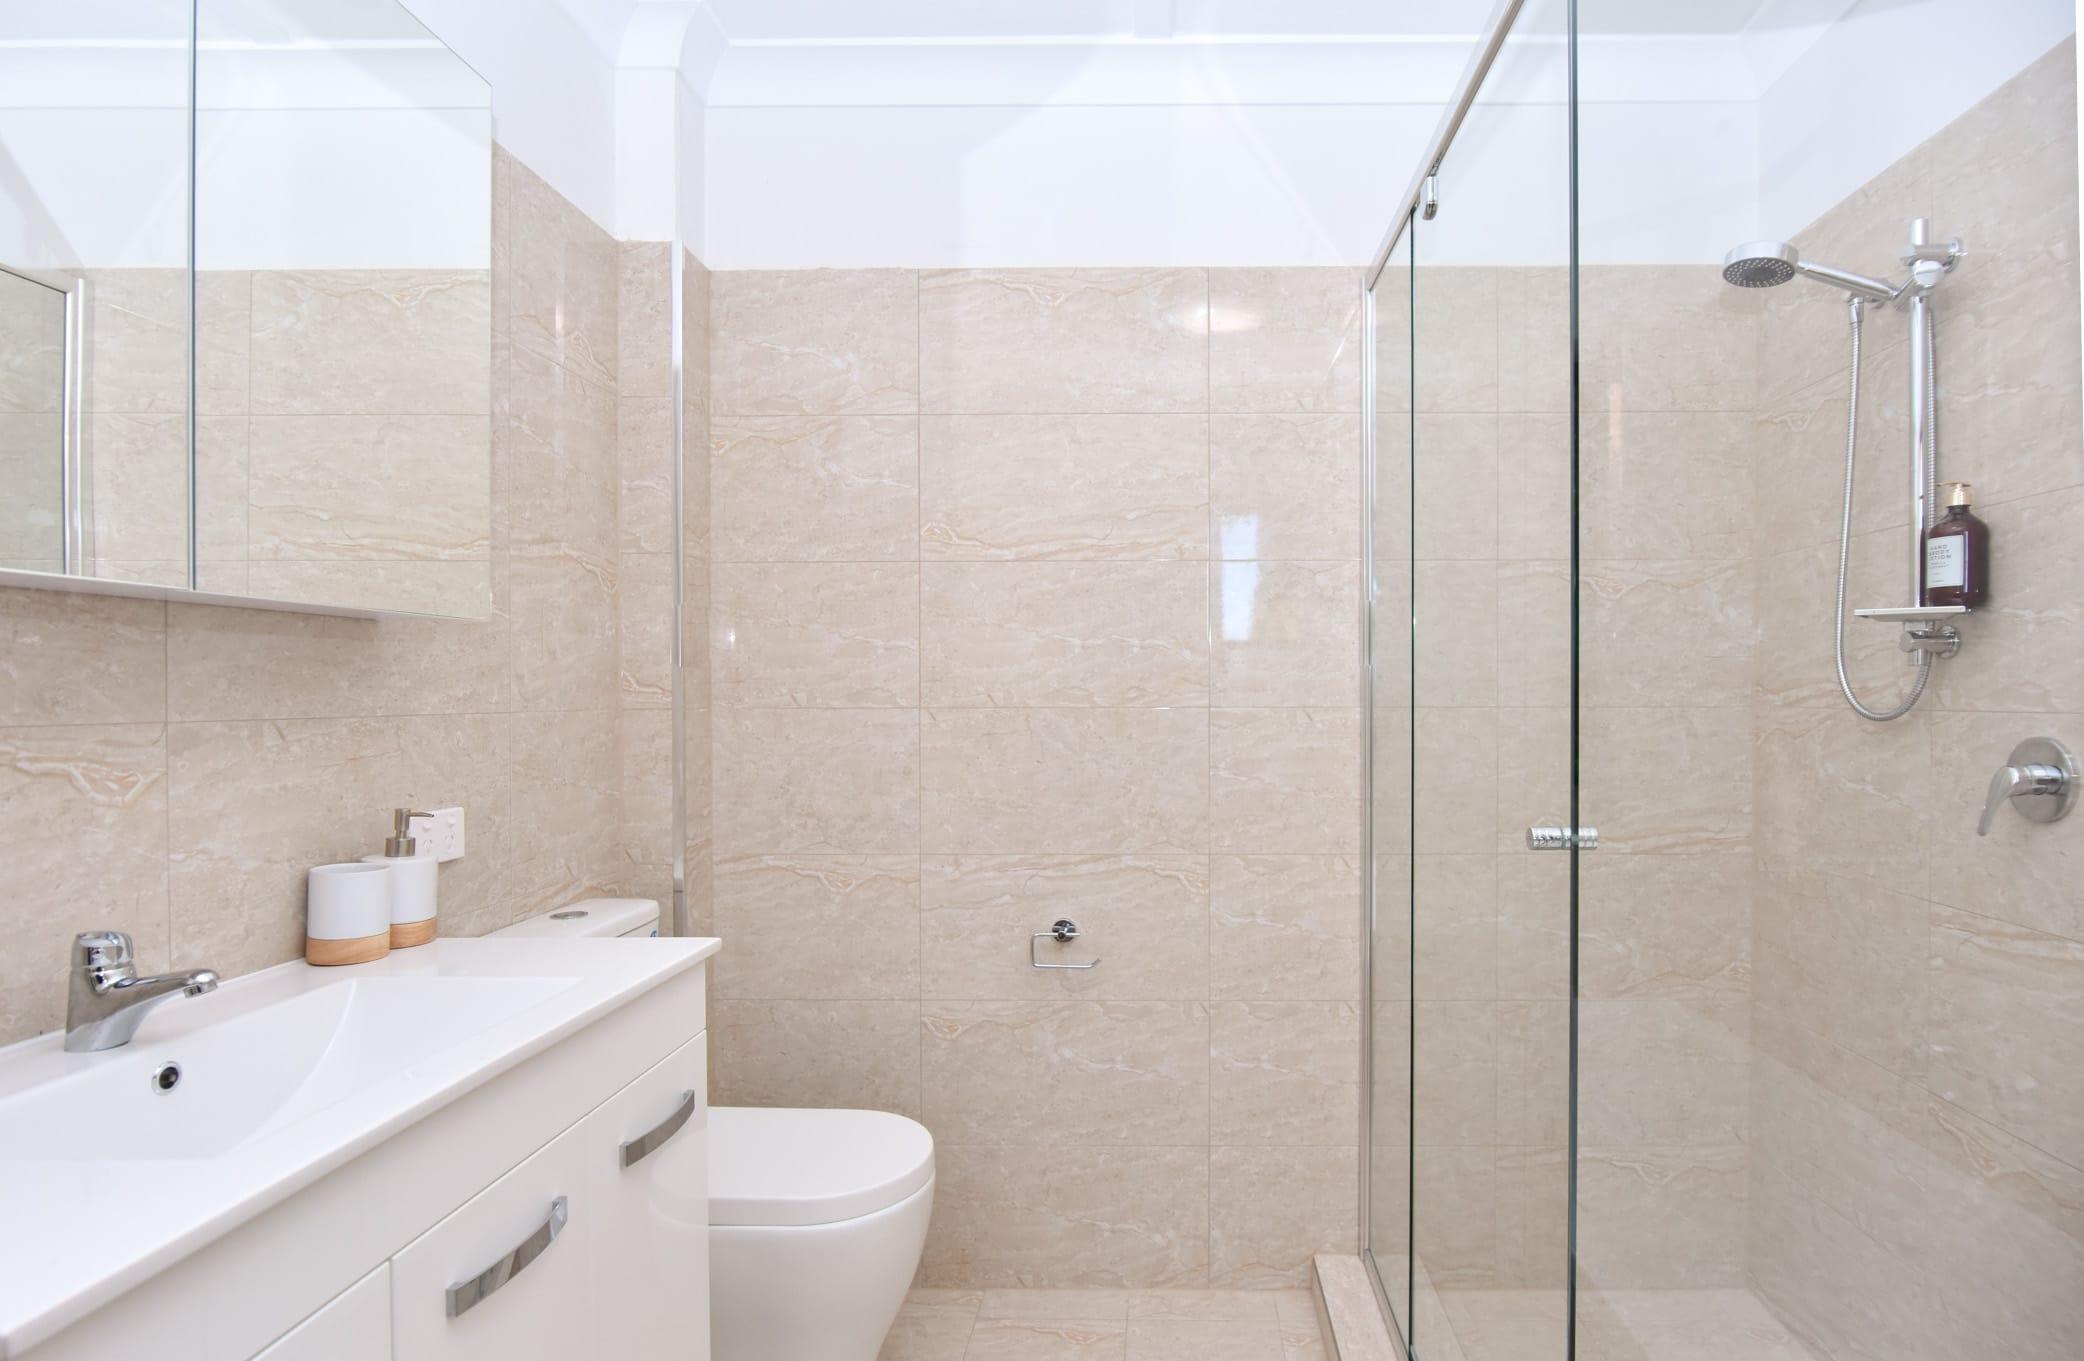 Bathrooms-39.jpg#asset:2404